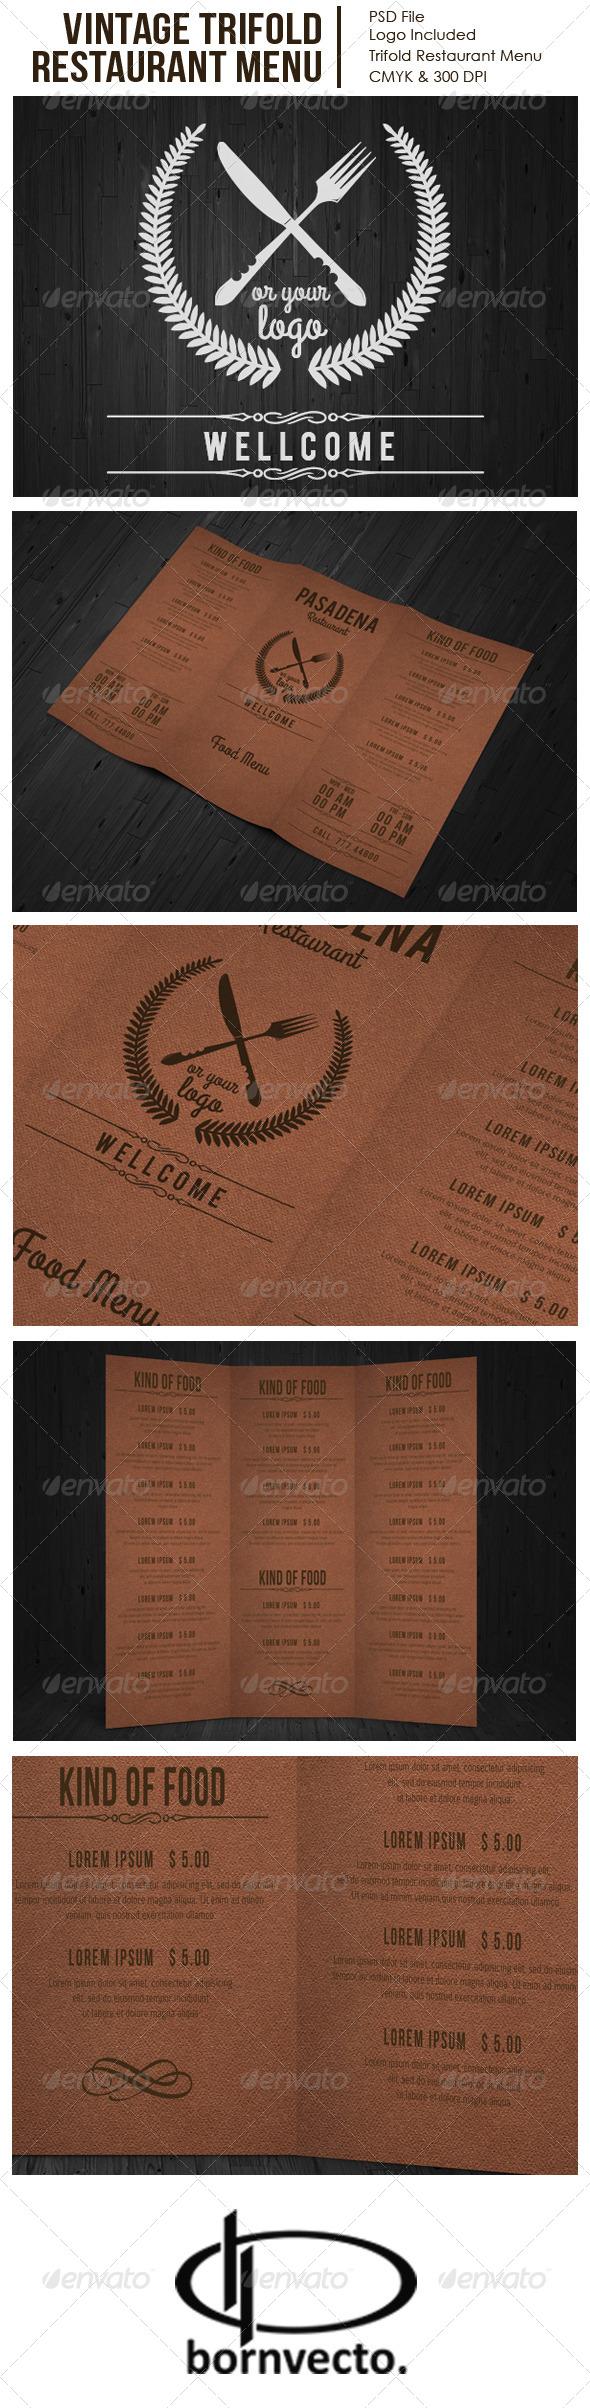 GraphicRiver Vintage Trifold Restaurant Menu 7294538